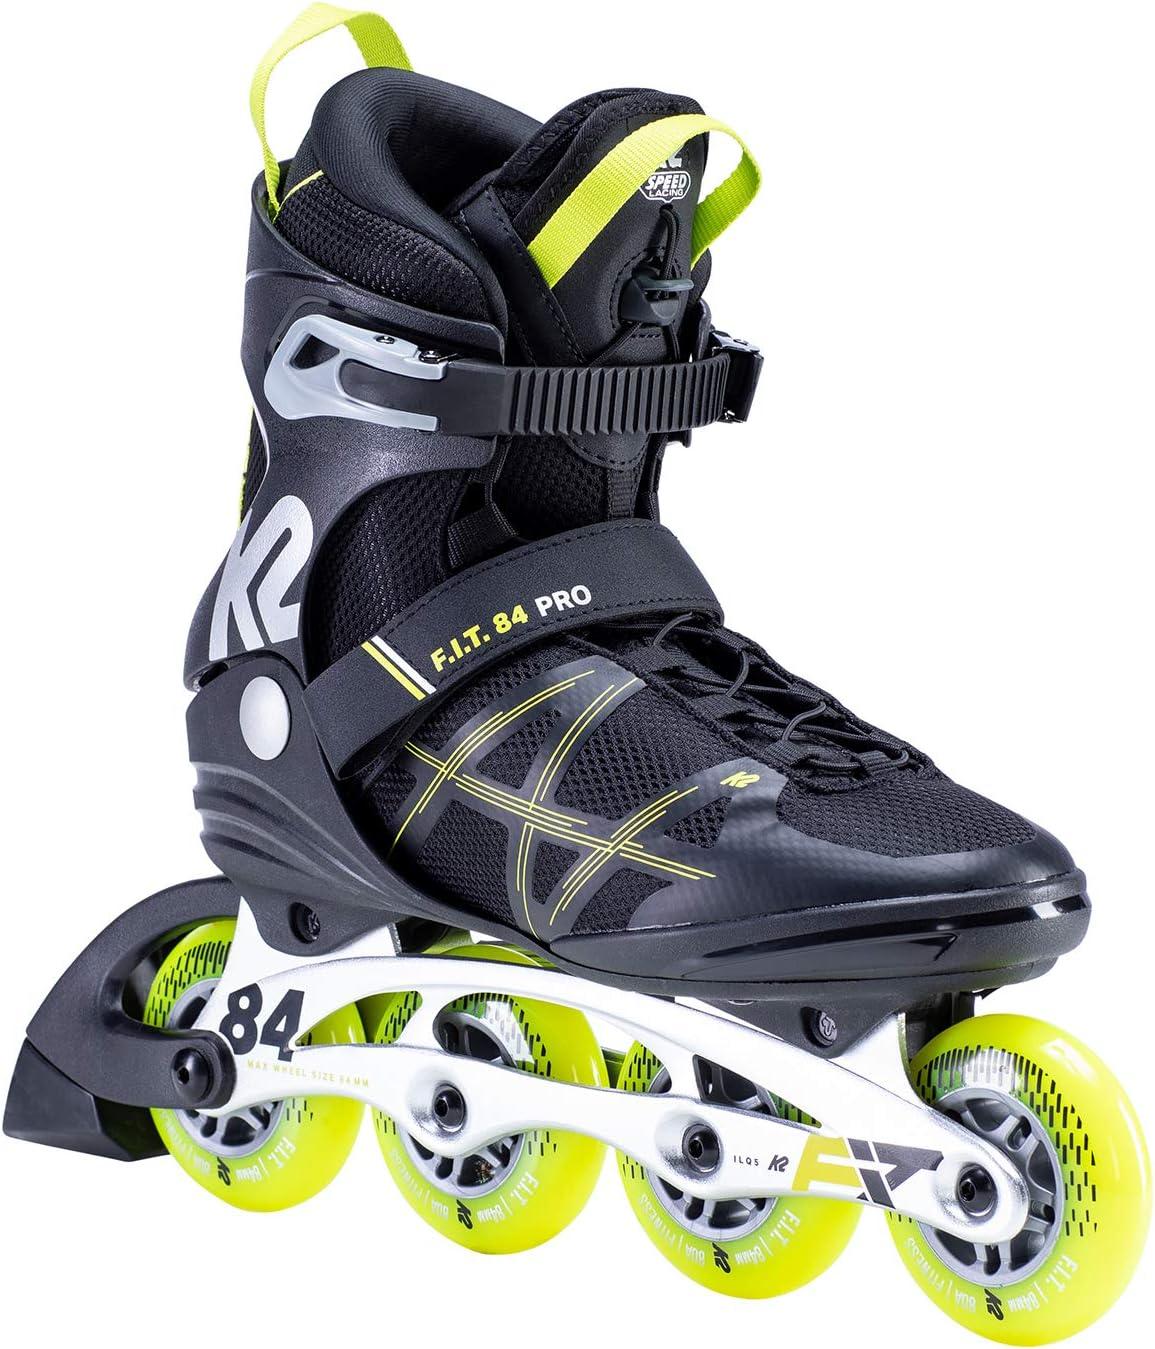 K2 Skate F.I.T 84 Pro Inline Skate